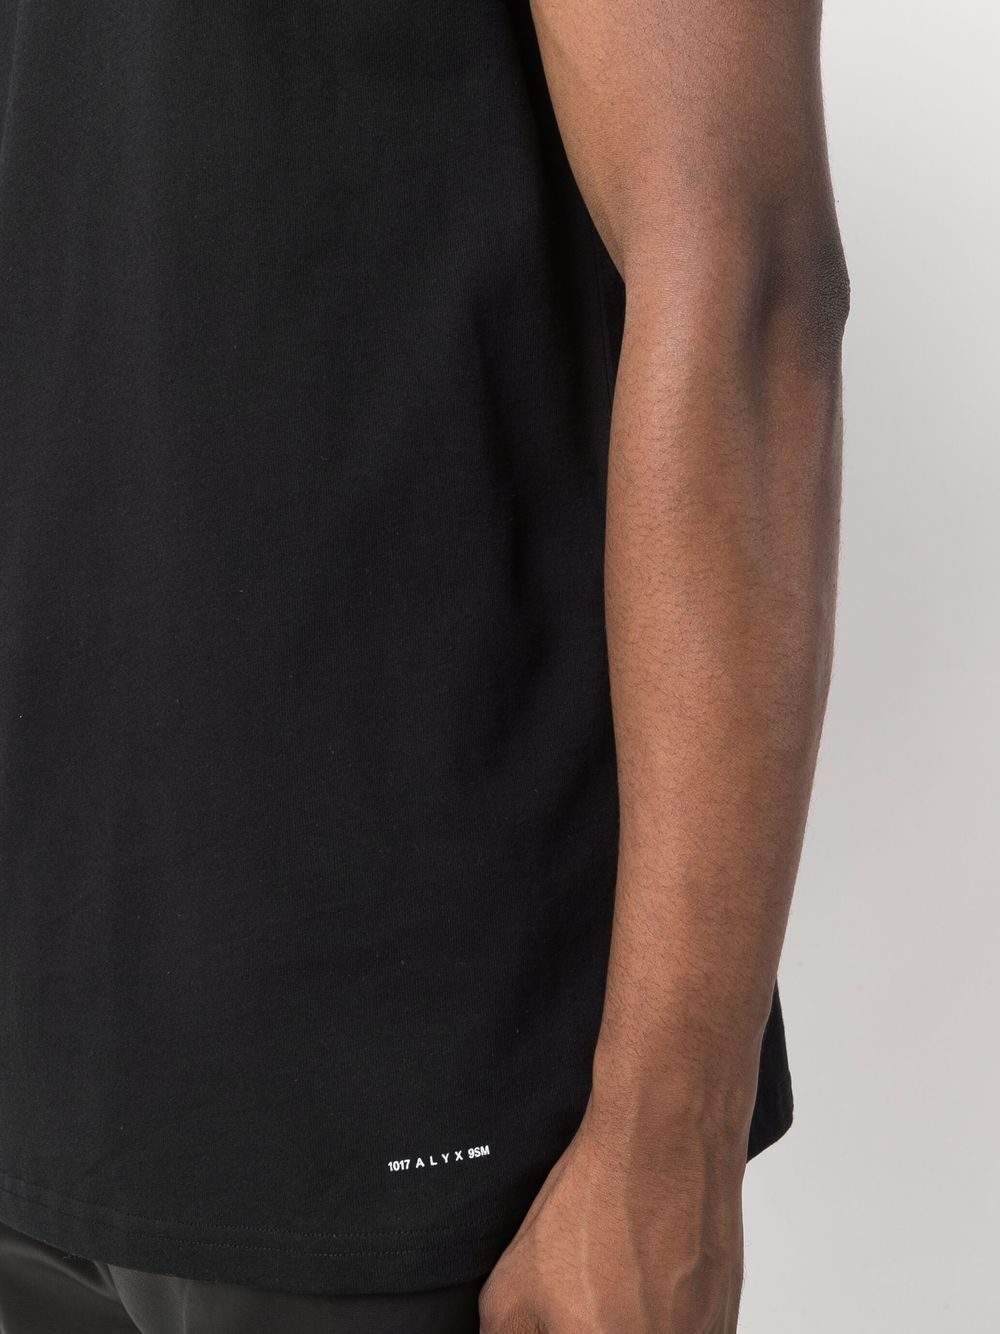 tripack t-shirt man black in cotton 1017 ALYX 9SM | T-shirts | AVUTS0024FA02BLK001